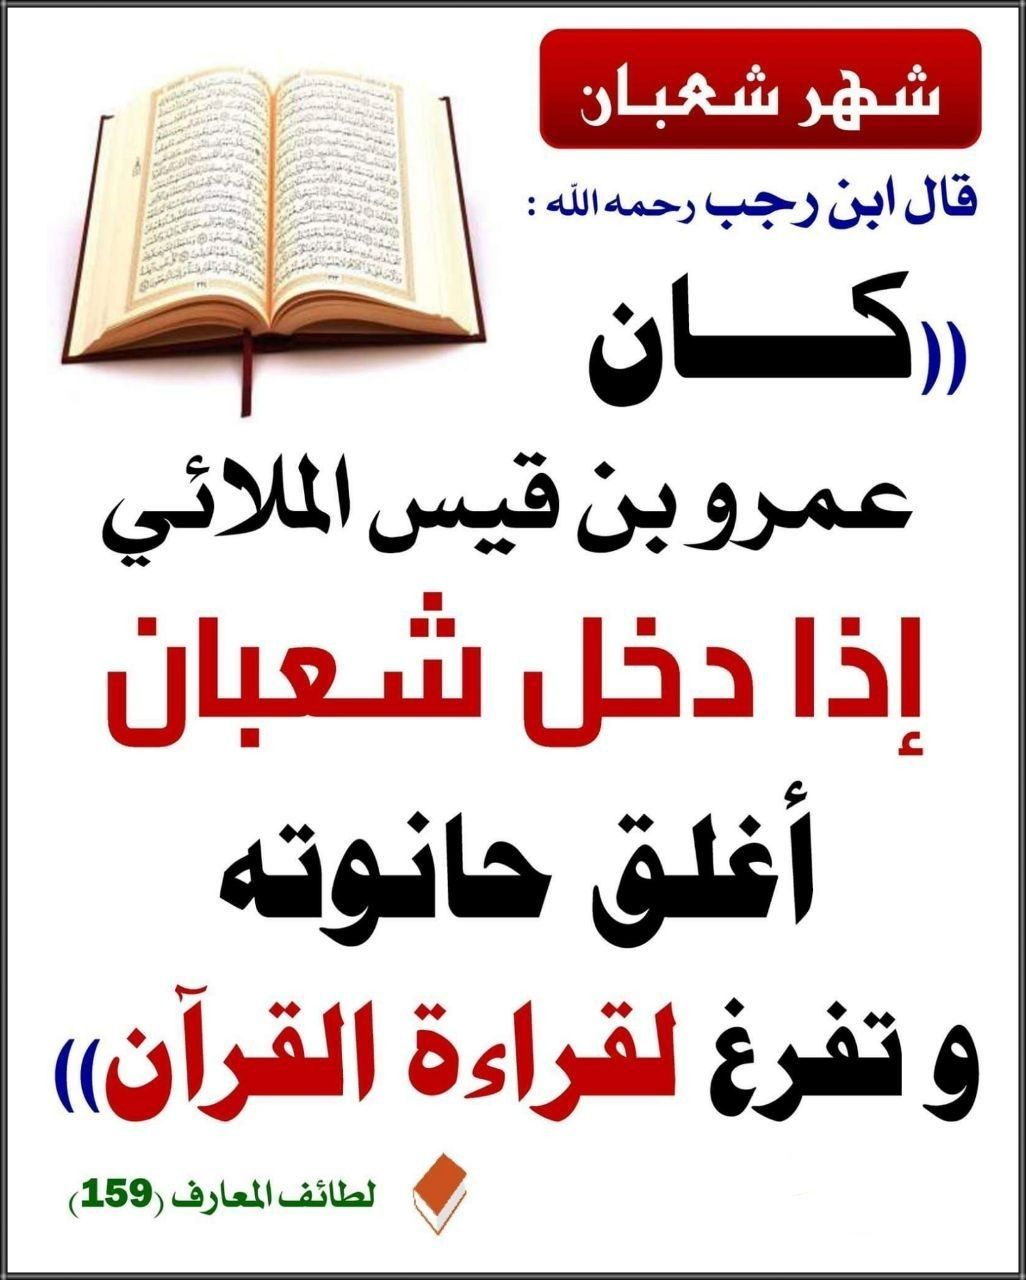 Pin By ام ماريا On اقوال الصحابة والائمة والعلماء Calligraphy Iga Arabic Calligraphy